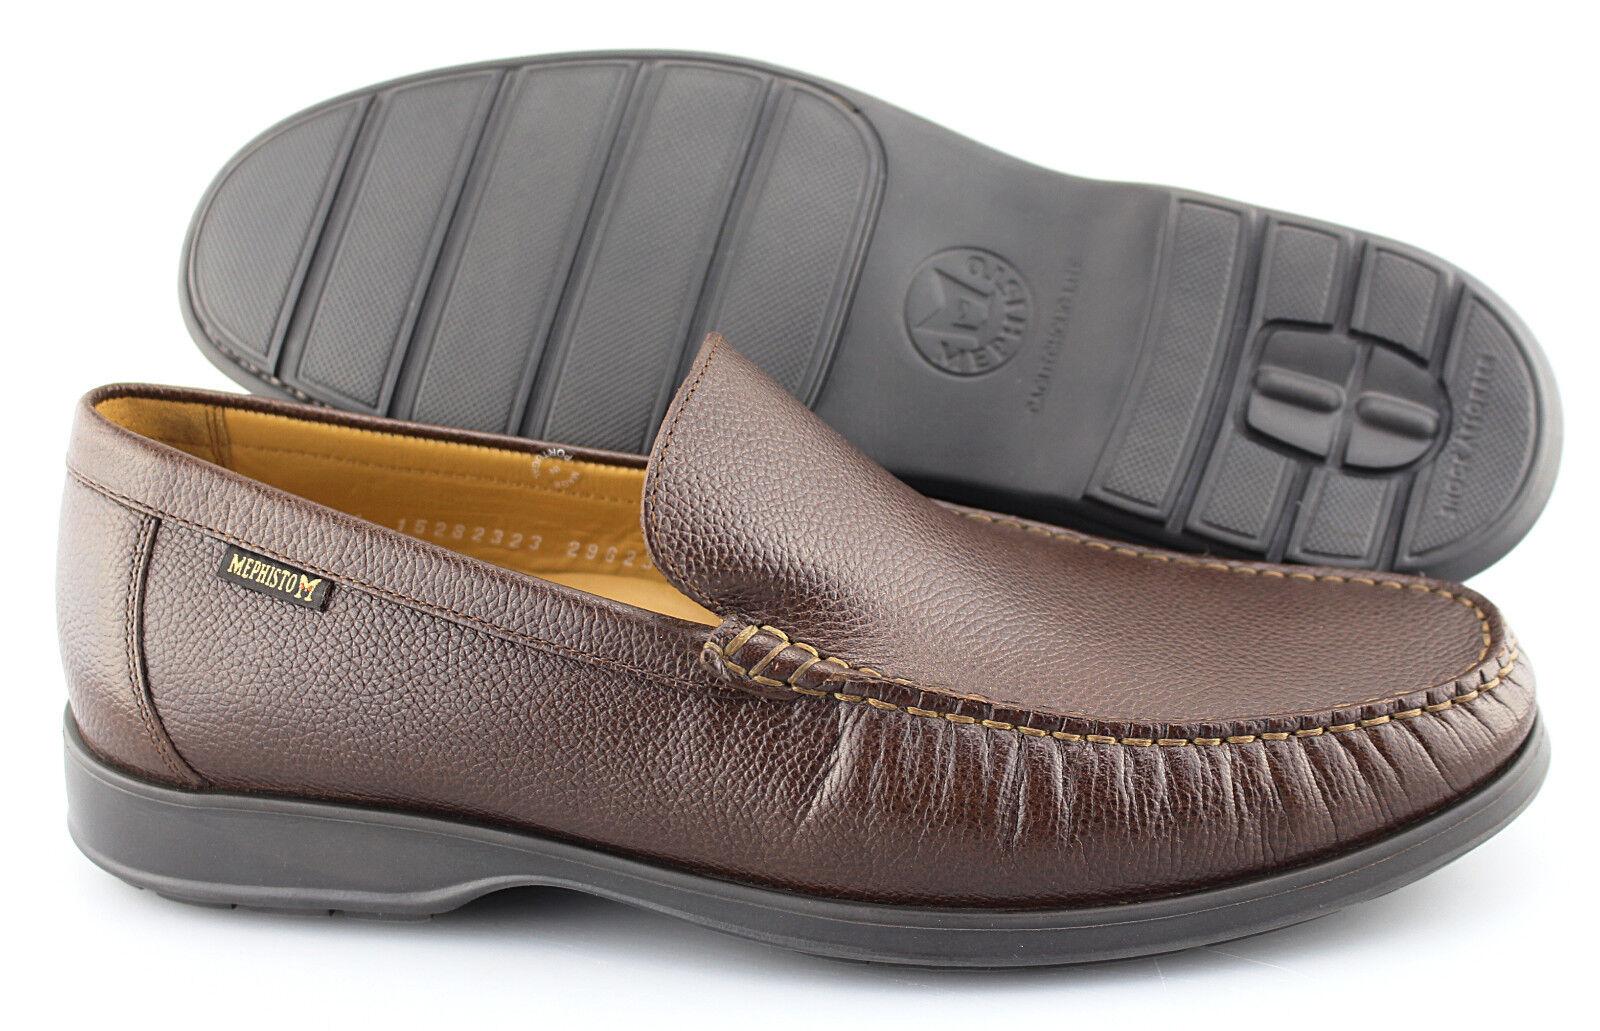 Men's MEPHISTO 'Henri' Chestnut Brown Leather Loafers Size US 9.5 EUR 9